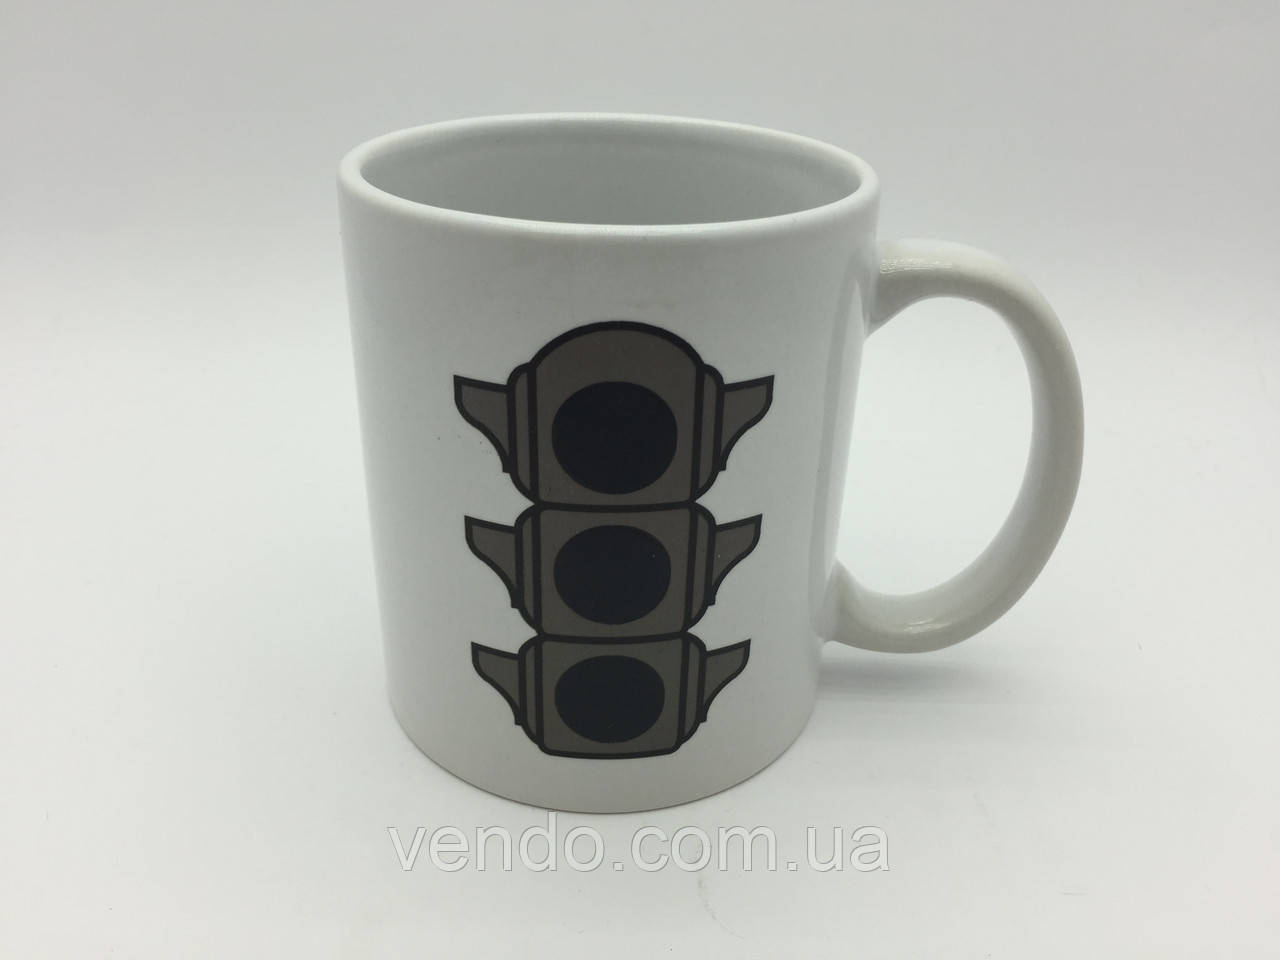 Кружка-чашка хамелеон с терморисунком Светофор